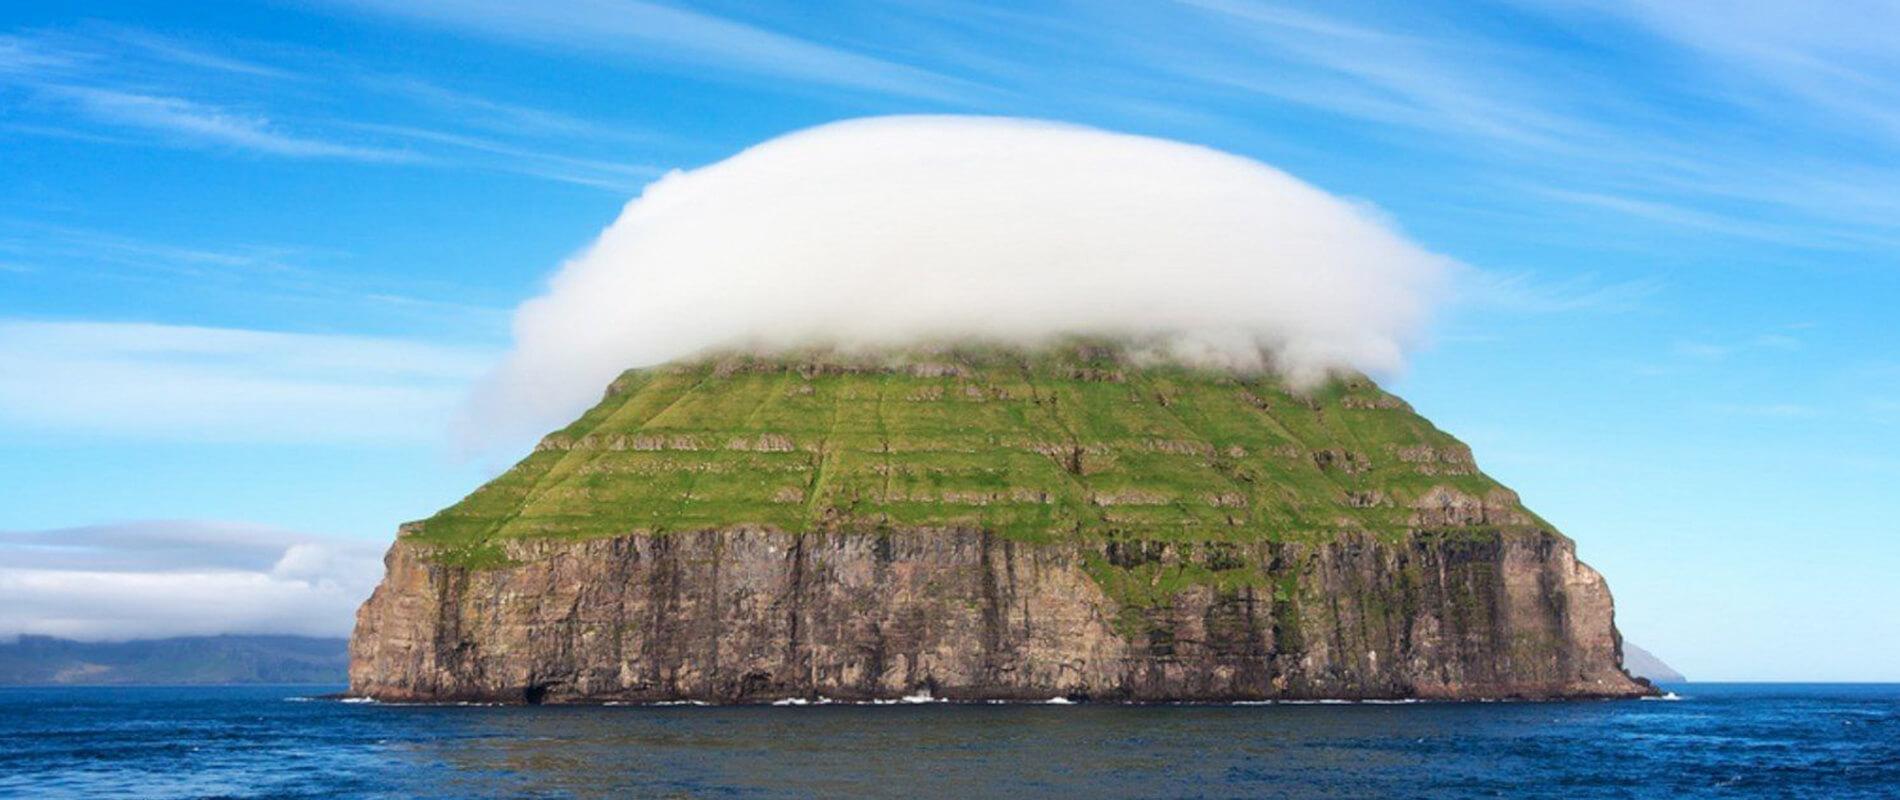 Lítla Dímun, an Islet Wrapped in a Soft Cloud